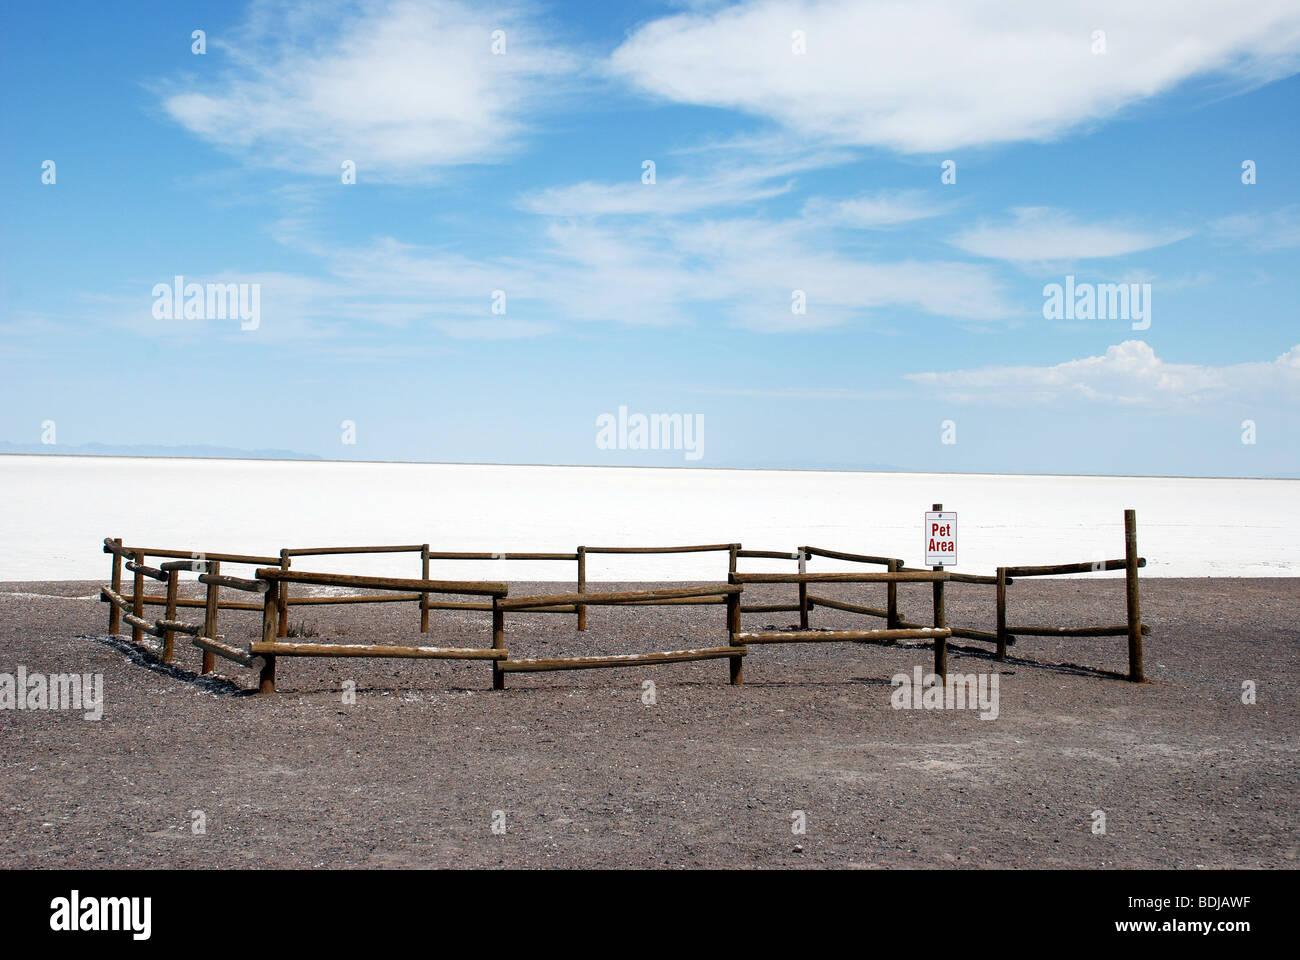 Fenced off Pet Area at the Bonneville Salt Flats in Utah, USA. - Stock Image